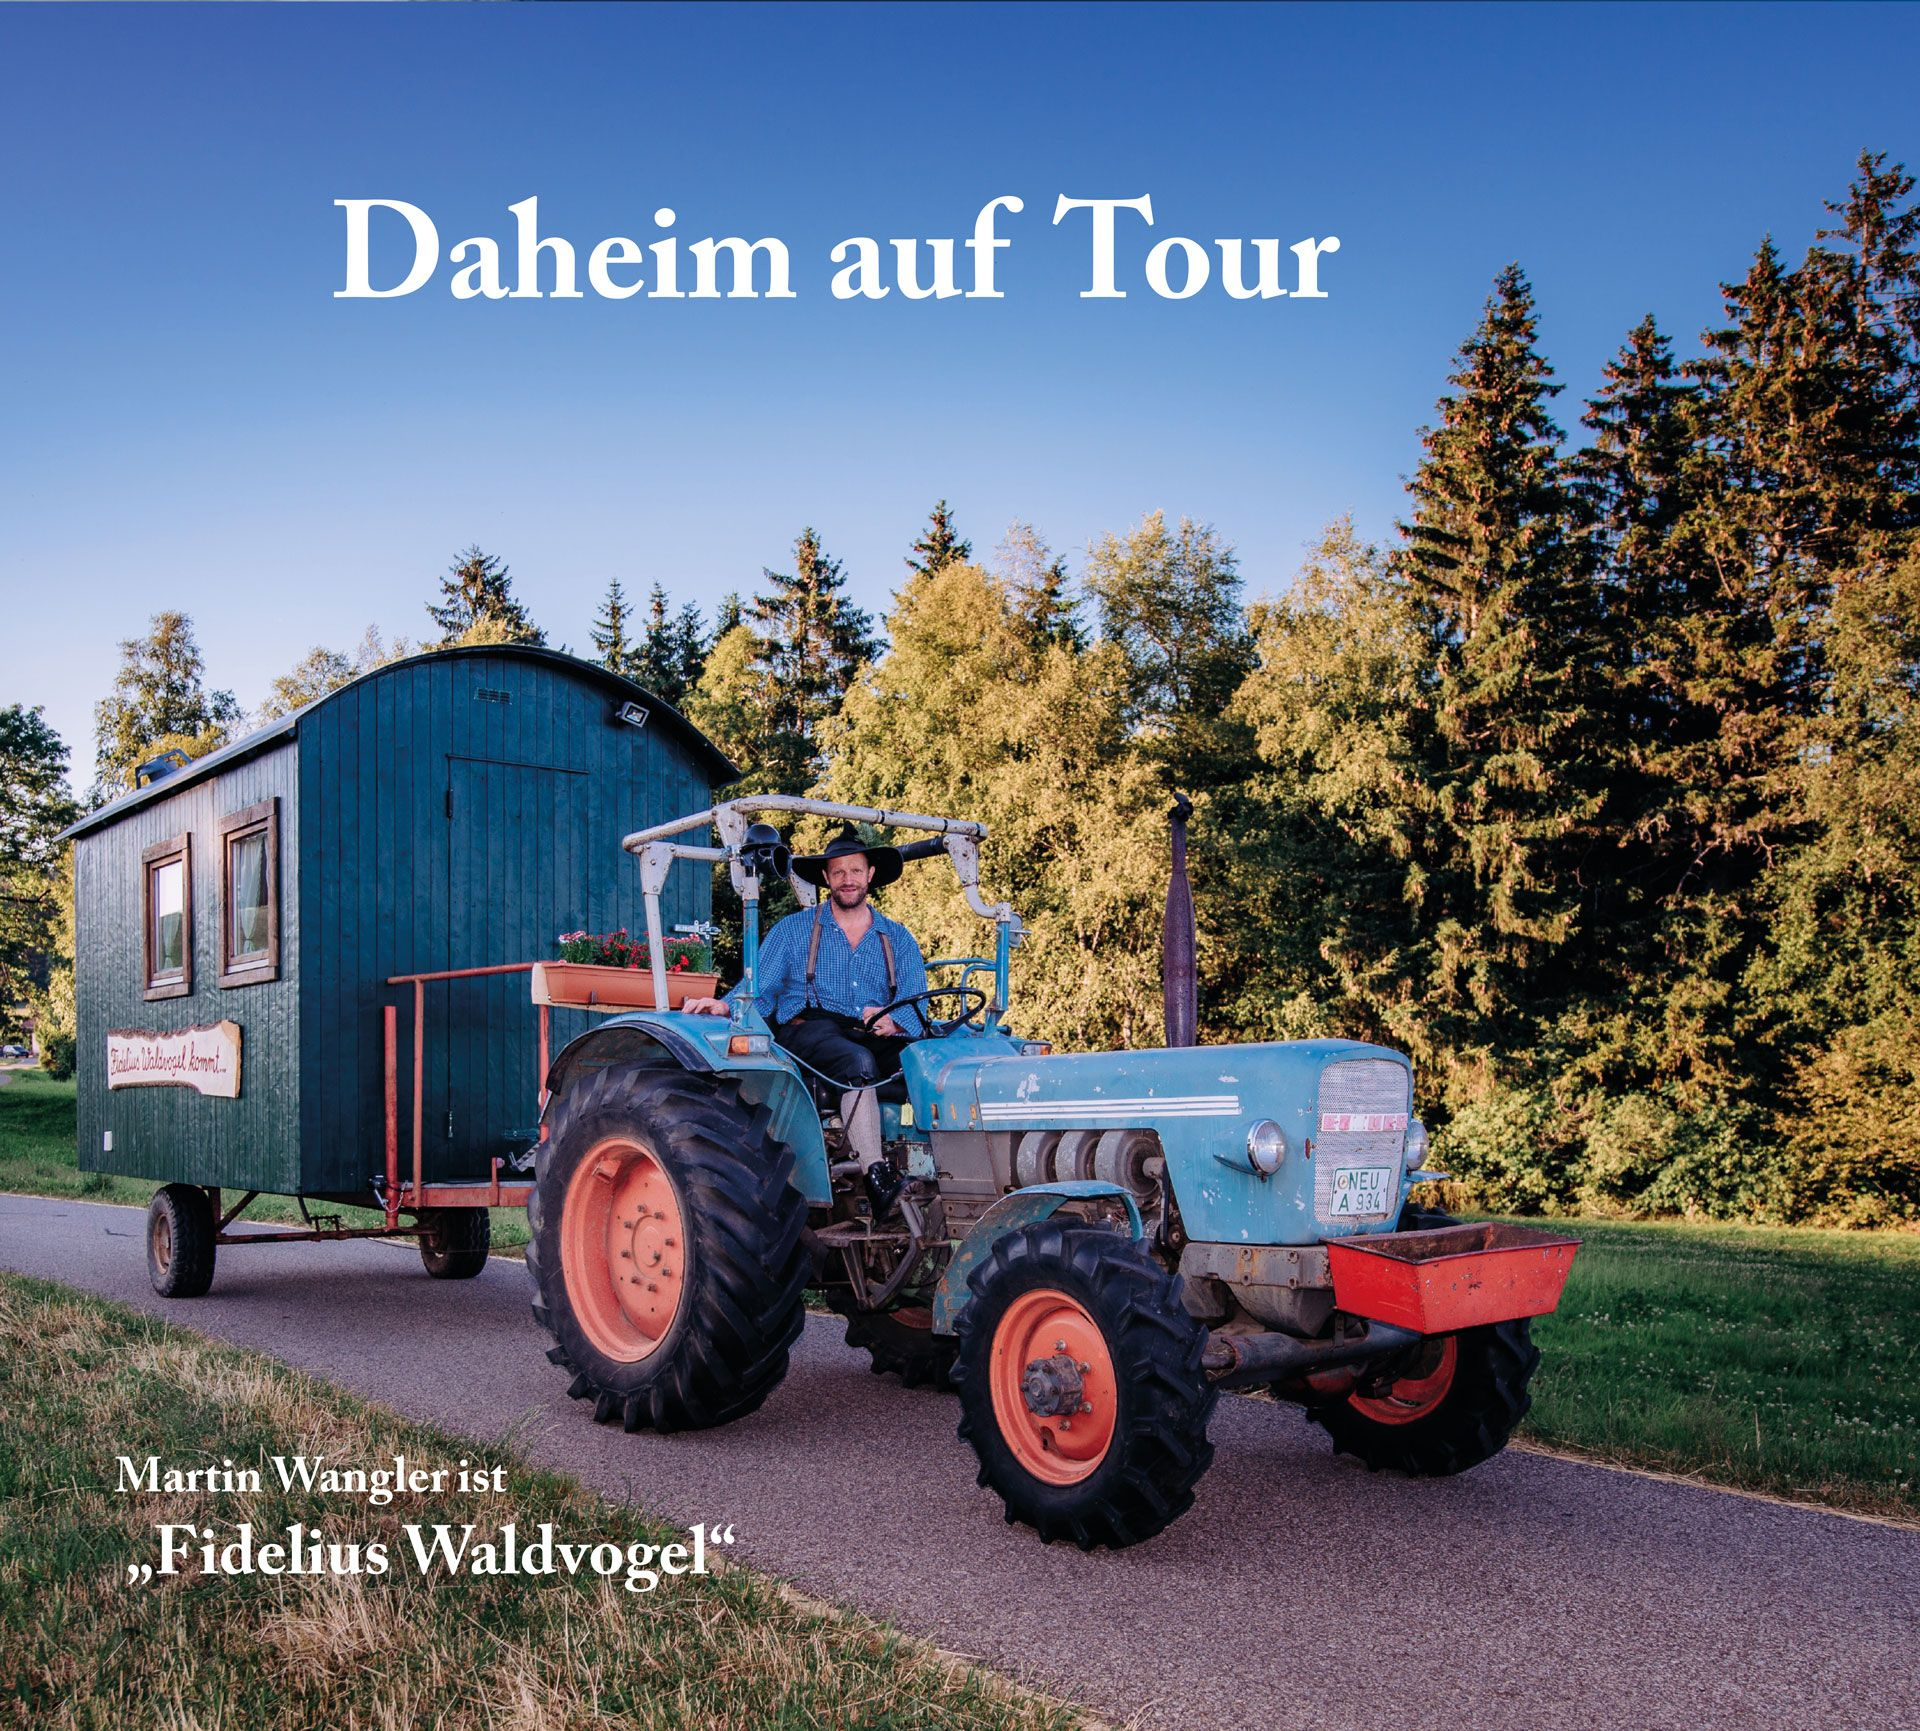 CD Daheim auf Tour